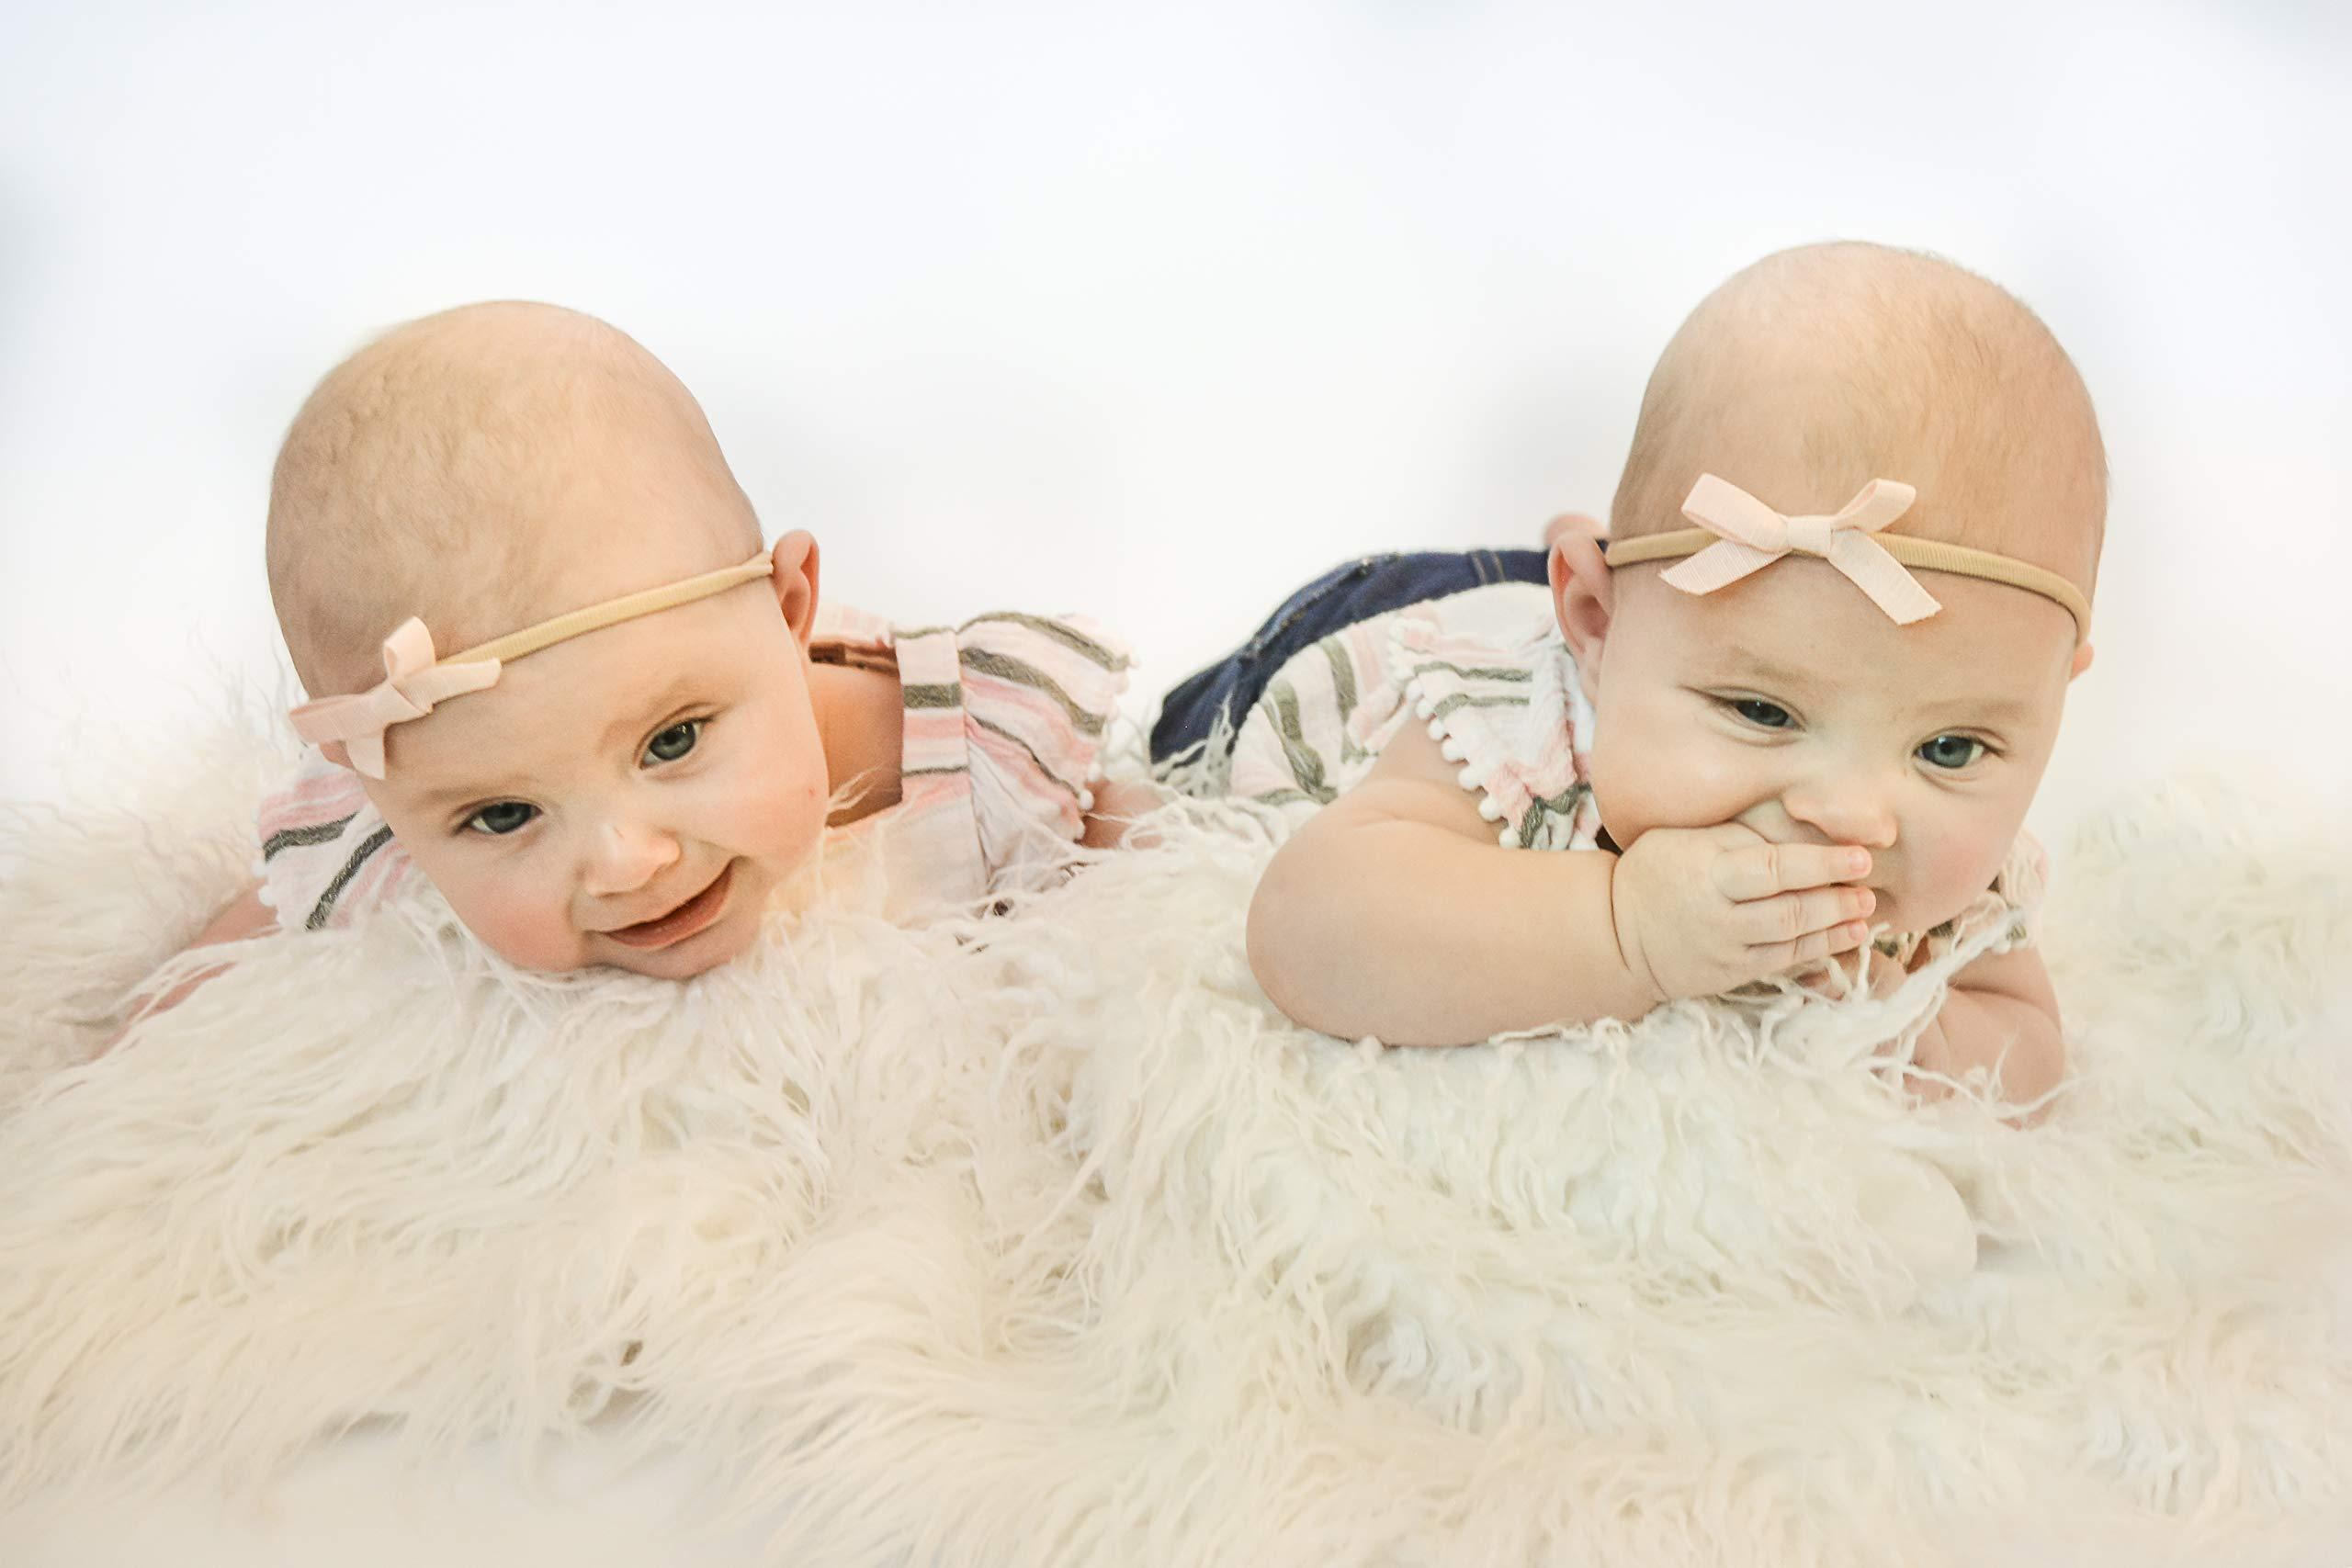 Helluva Baby 5 Piece Newborn Photography Props | Extra-Soft Newborn Pillow Set | Pre-Filled Newborn Posing Pillow | Pre-Filled Props for Baby Photography | Newborn Props for Photography by Helluva Baby (Image #4)